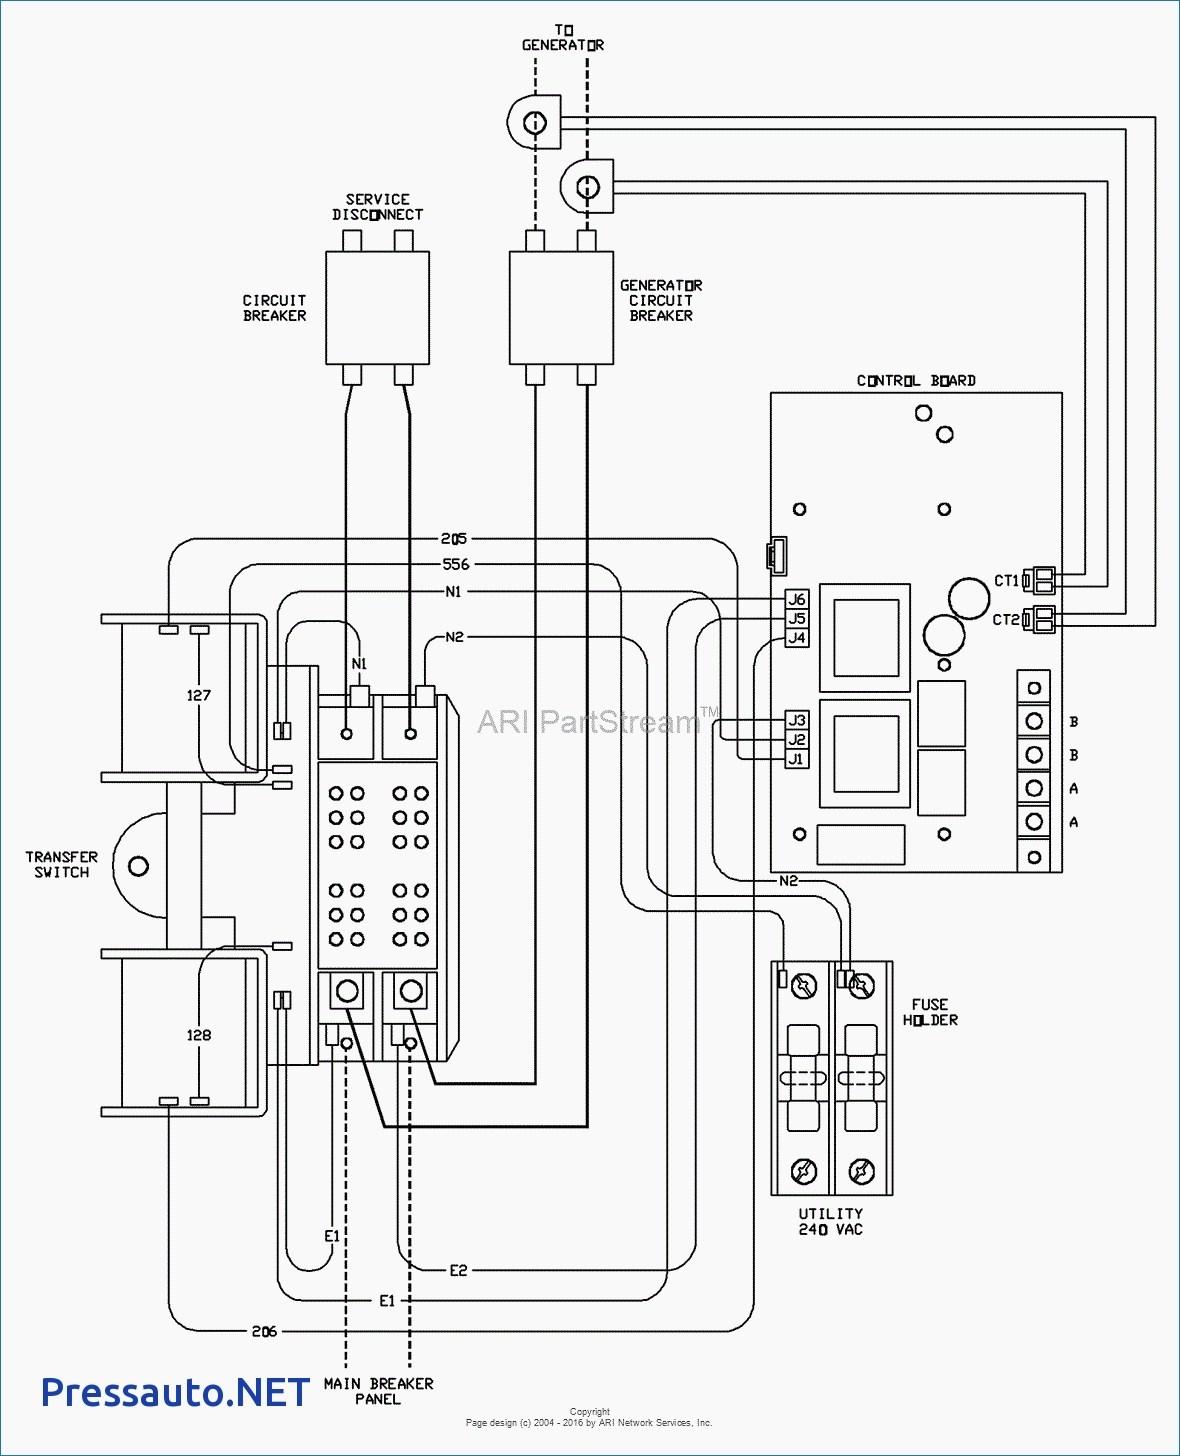 gentran transfer switch wiring diagram Collection-Whole House Transfer Switch Wiring Diagram Beautiful Generator Manual Transfer Switch Wiring Diagram 10-s